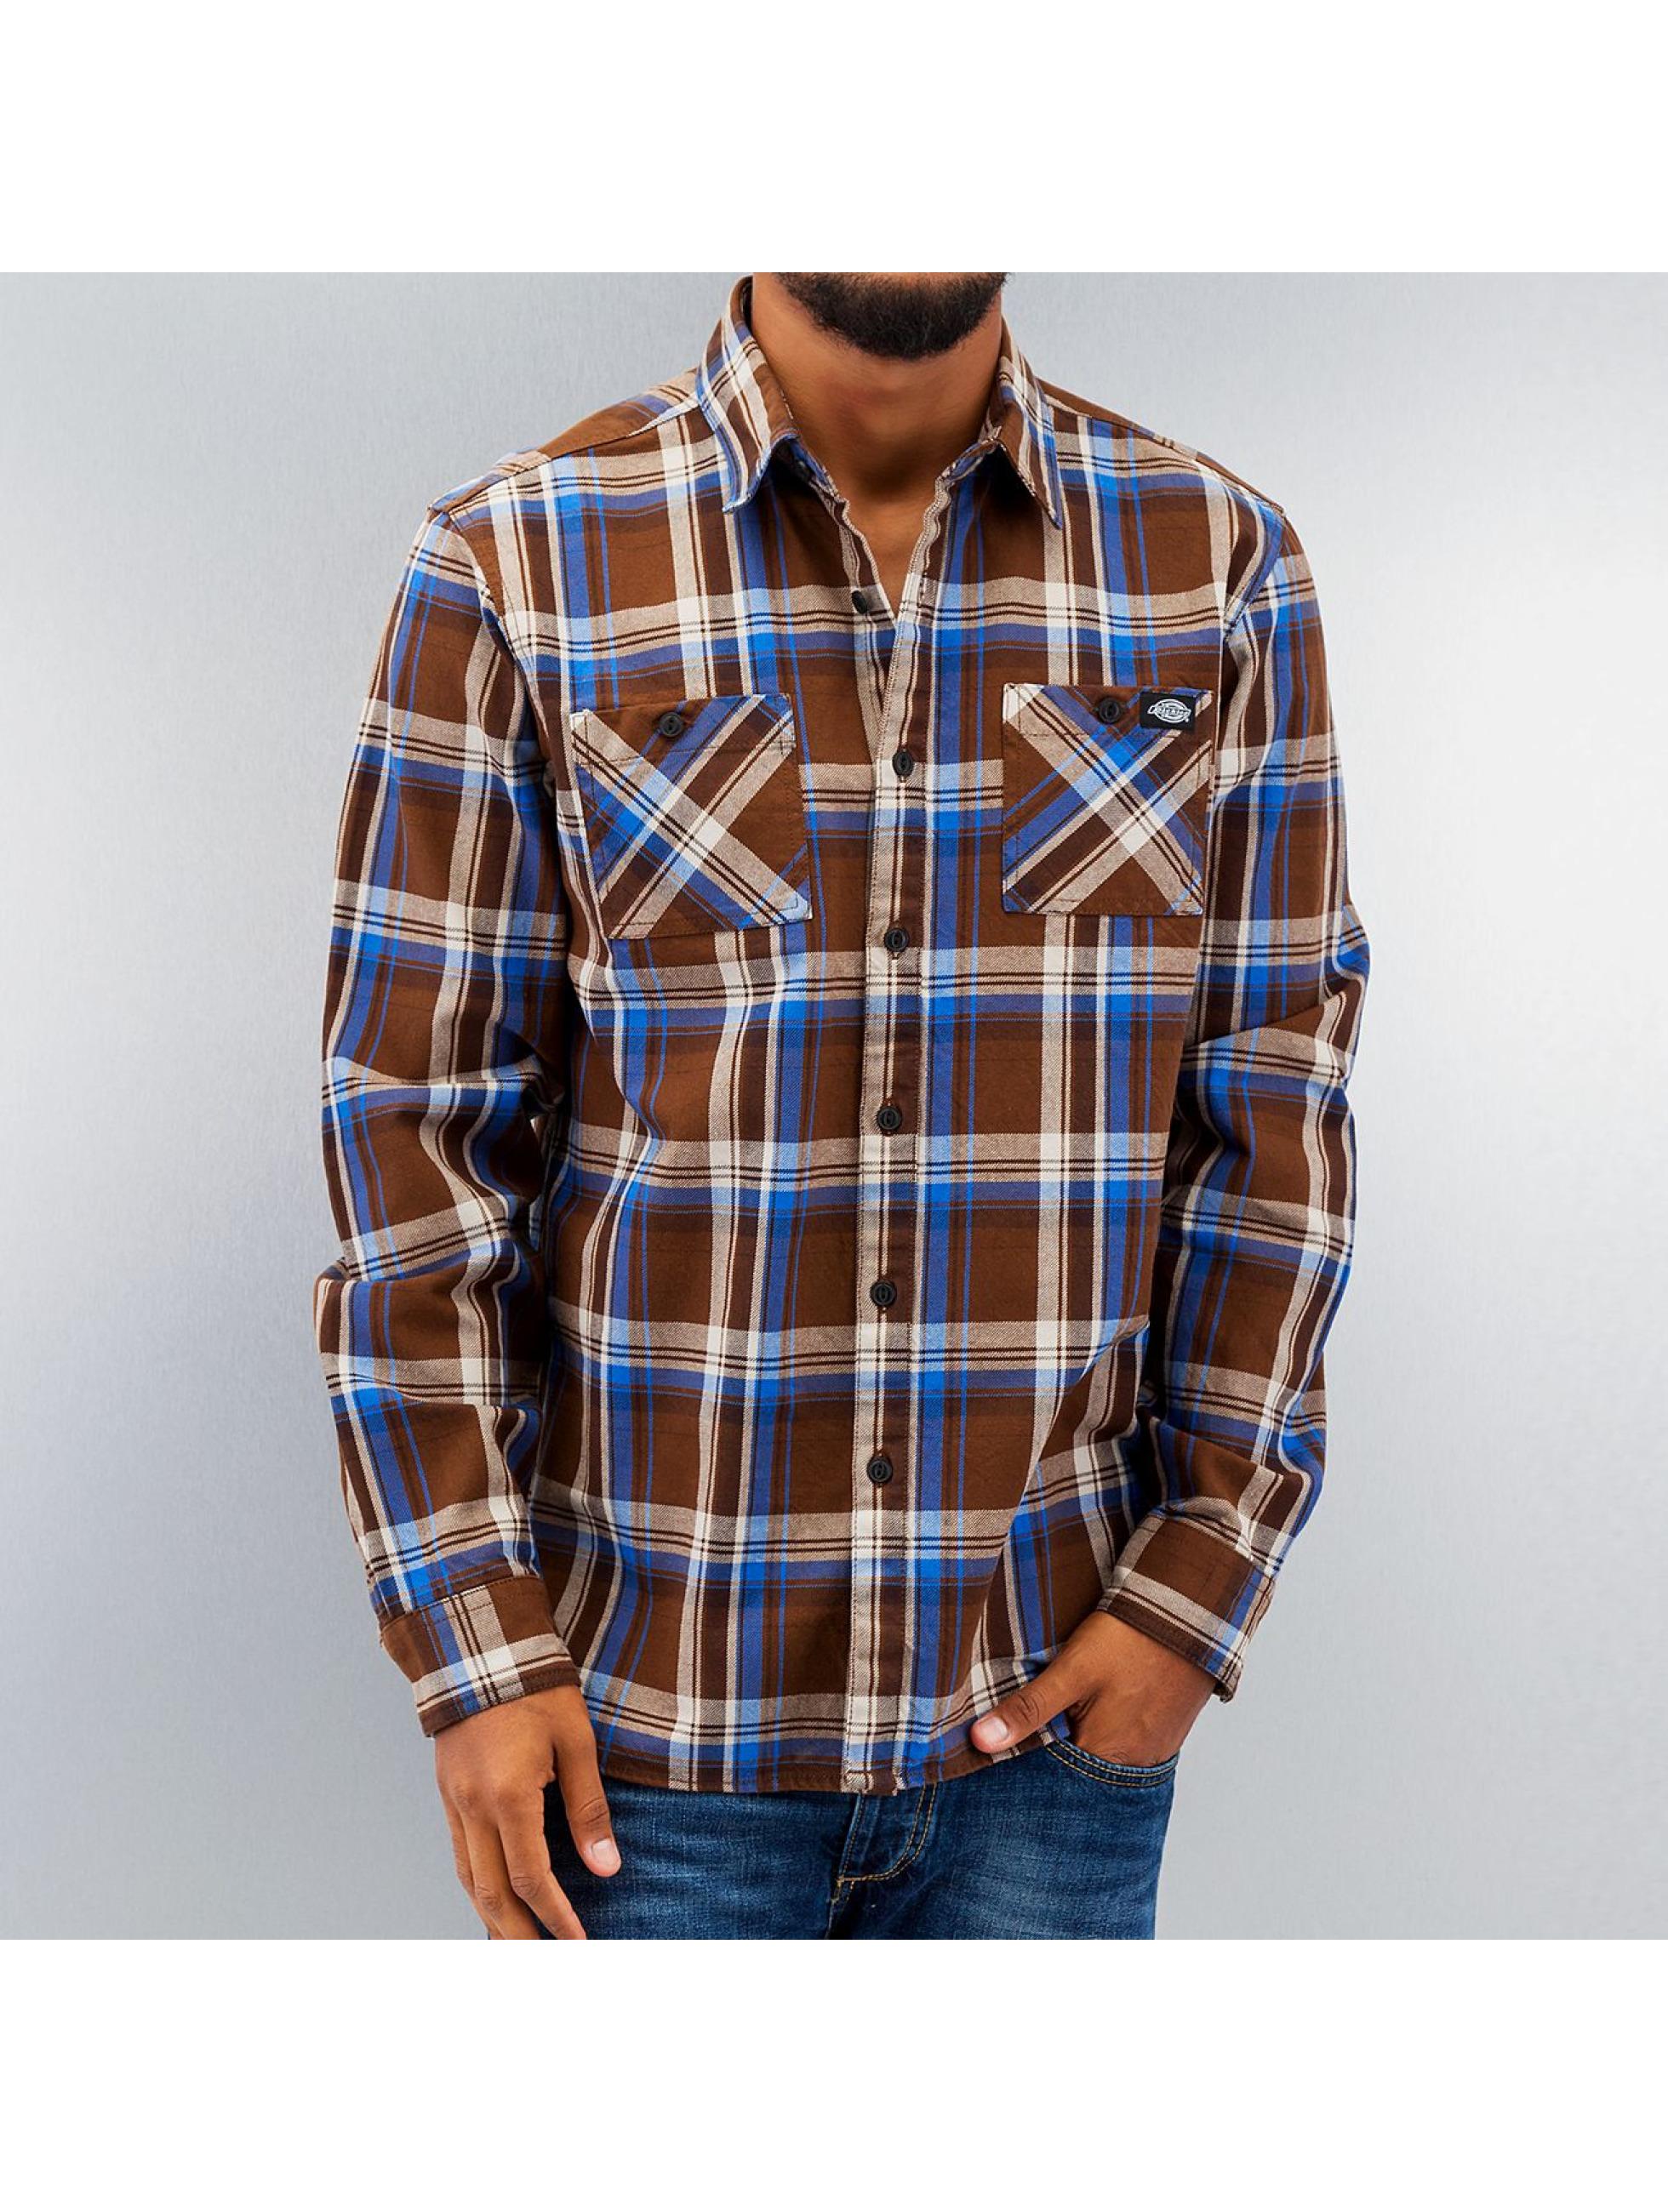 Dickies overhemd Atwood bruin